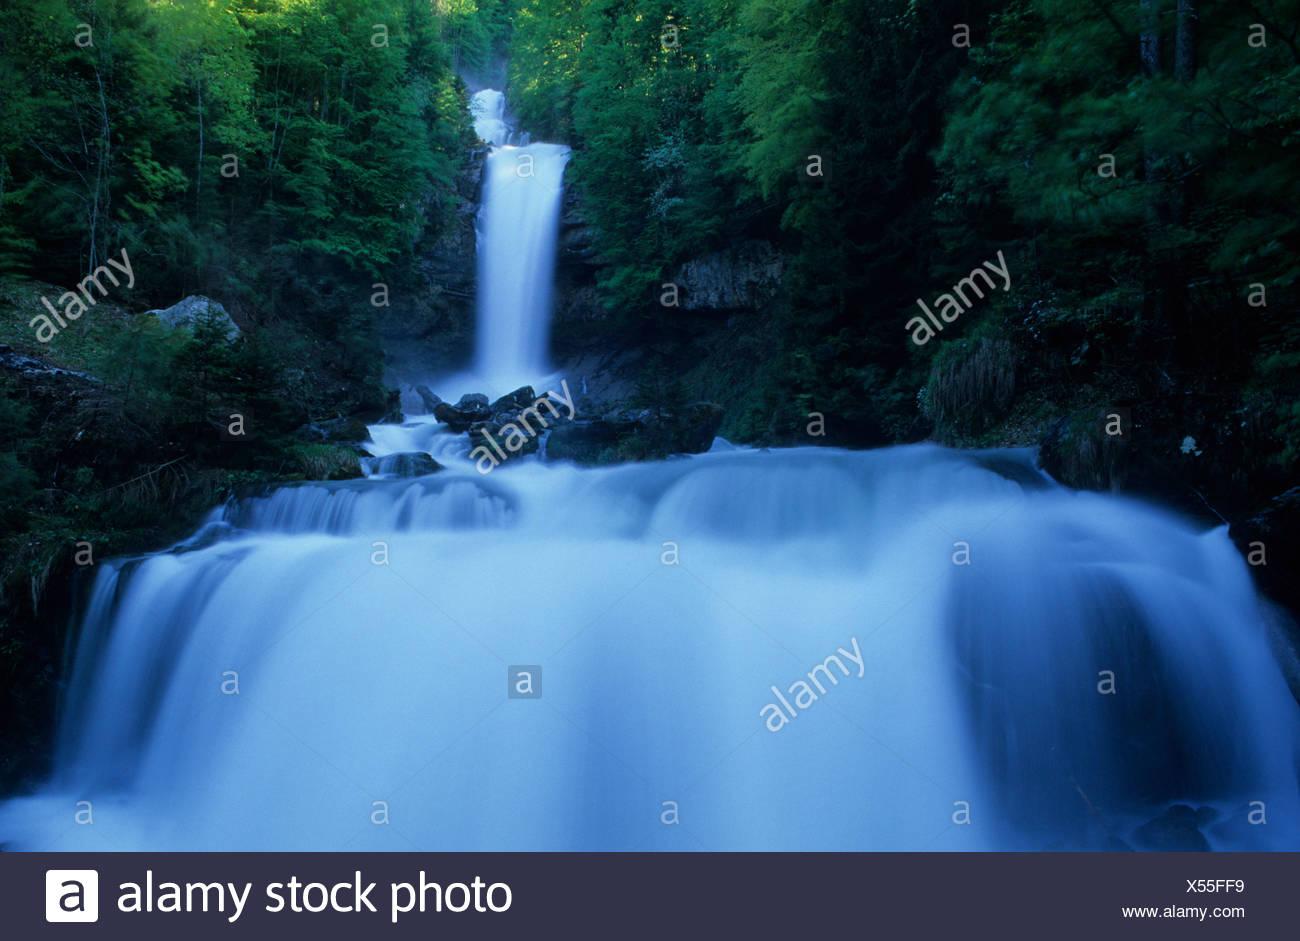 Europe Switzerland Canton of Bern Bernese Oberland Giessbachfälle Giessbach falls waterfall water nature scenery creek stream Stock Photo